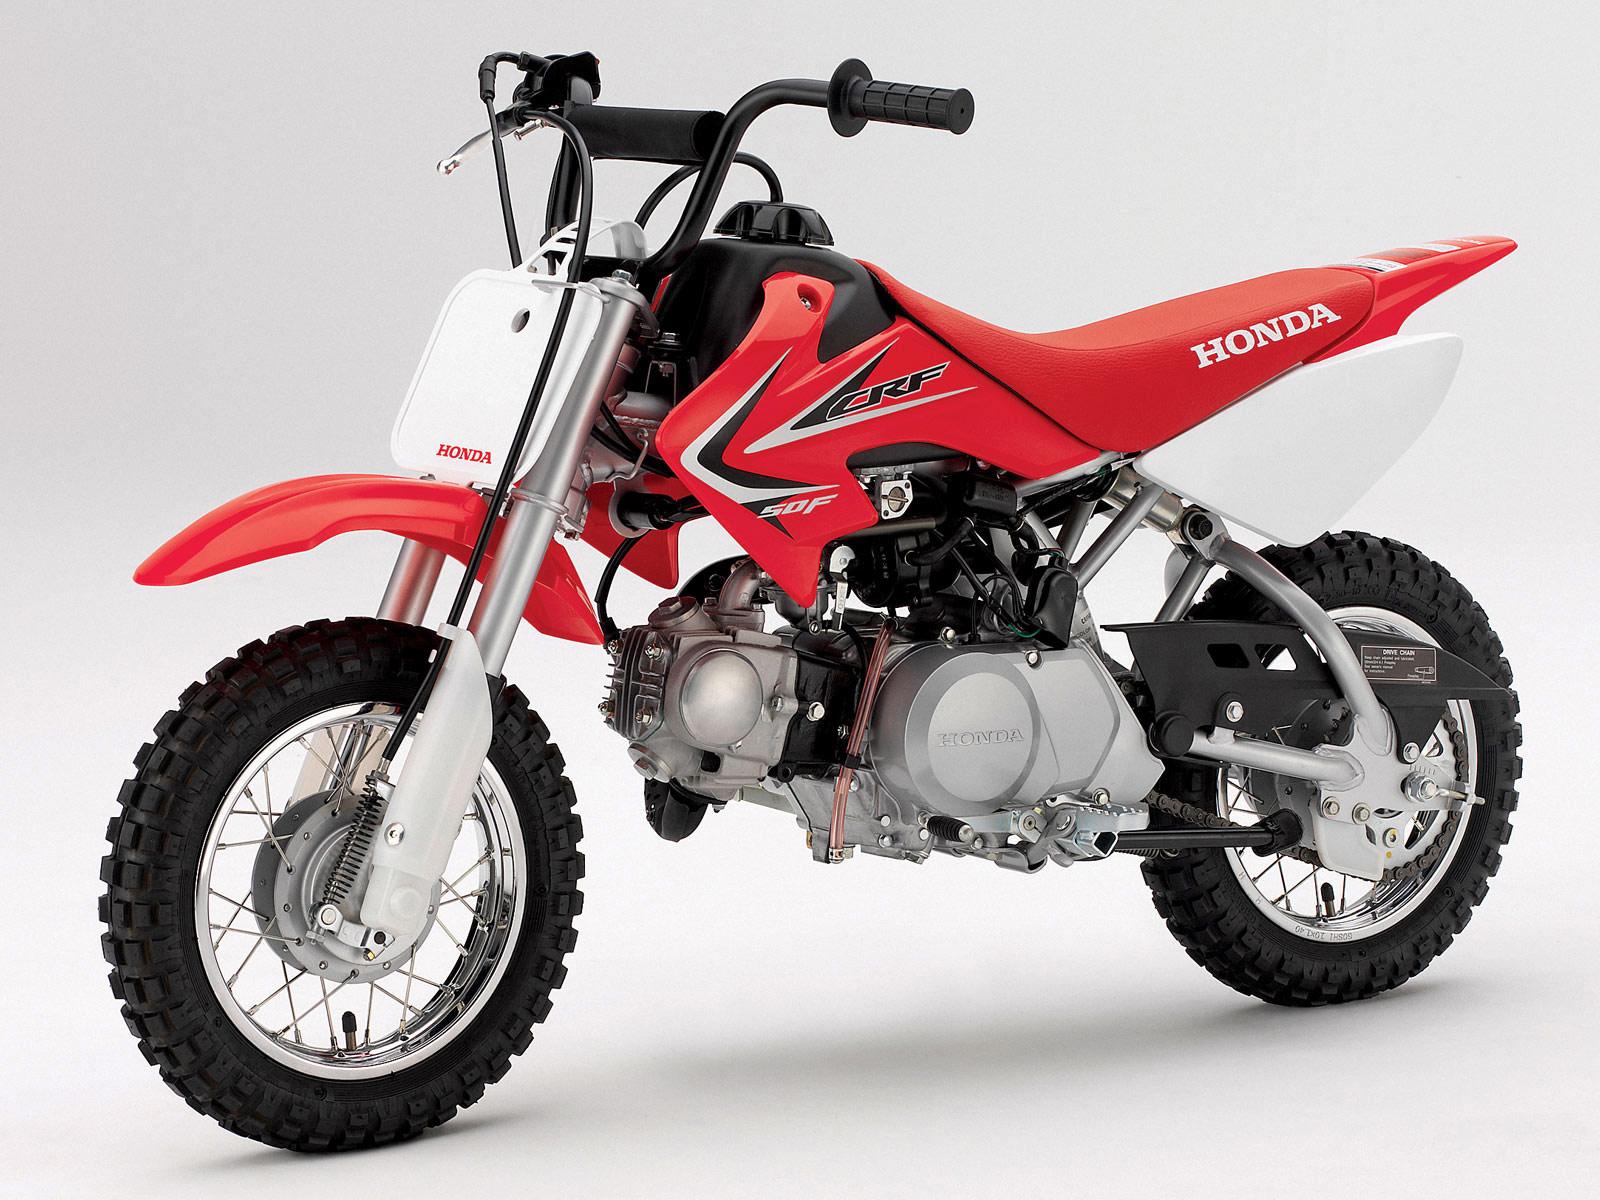 2011 honda crf50f motorcycle pictures insurance. Black Bedroom Furniture Sets. Home Design Ideas